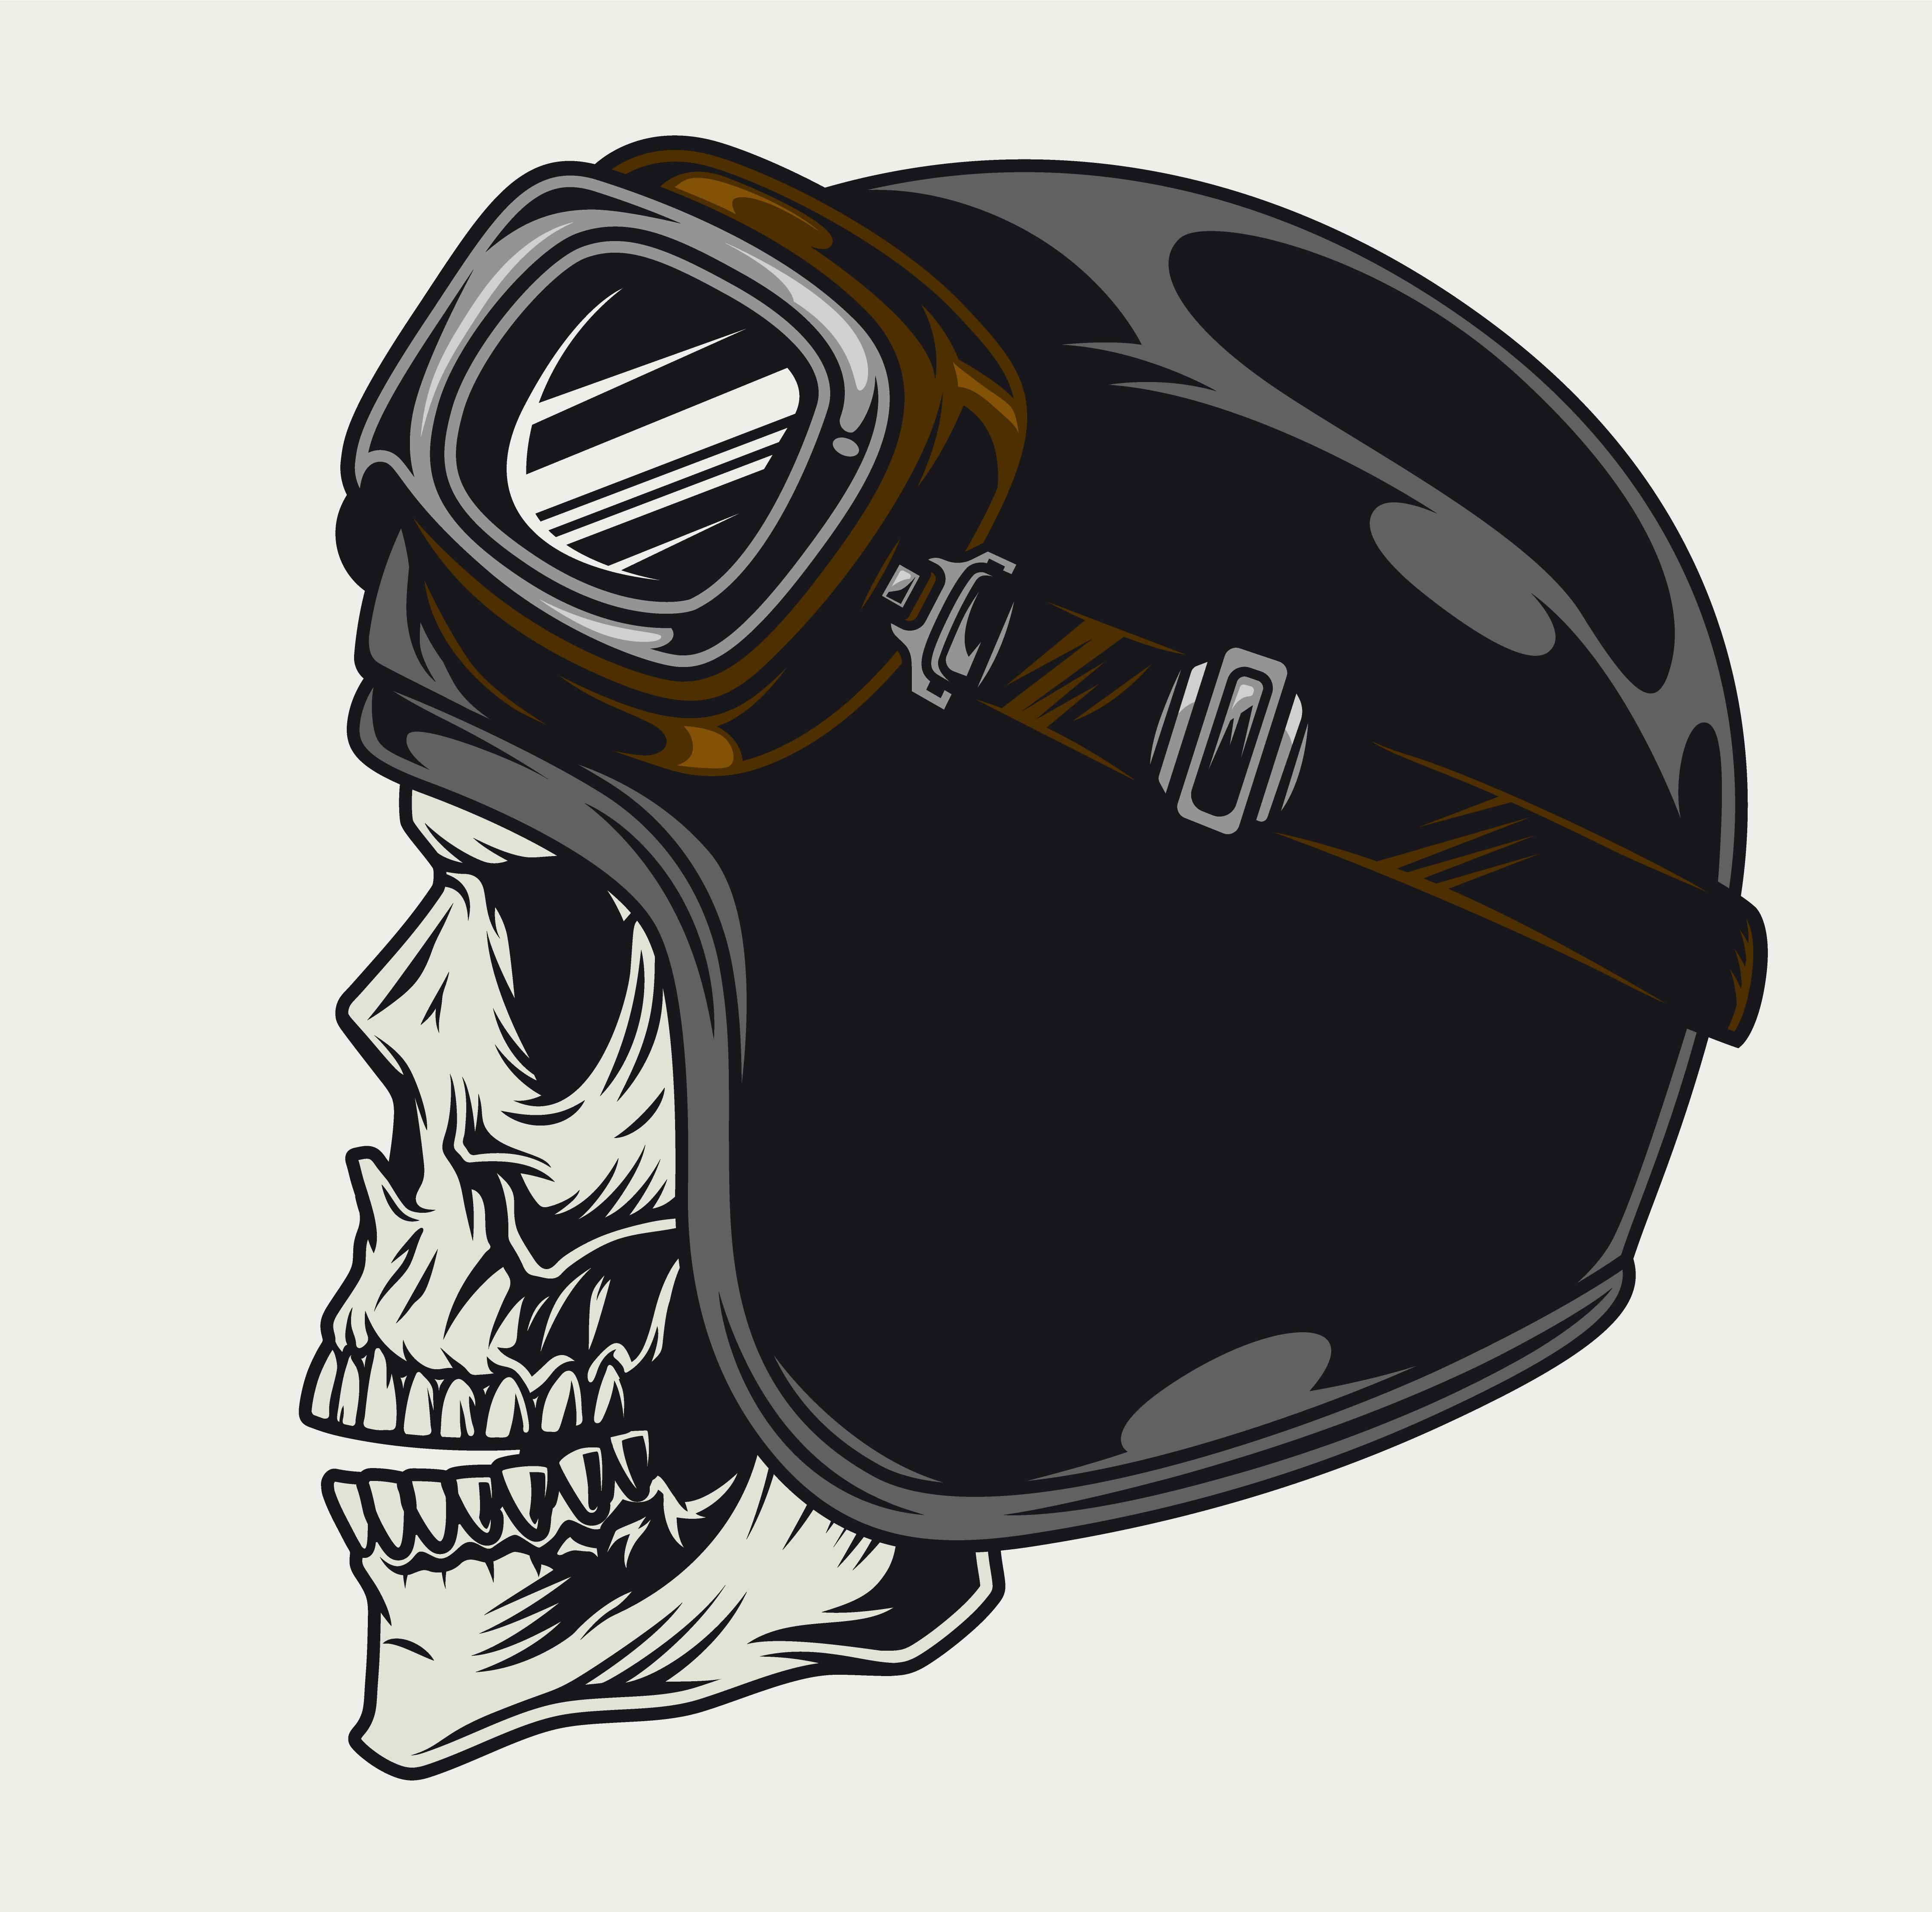 37 Vintage Custom Motorcycle Emblems In 2020 Adobe Illustrator Graphic Design Biker Art Car Artwork